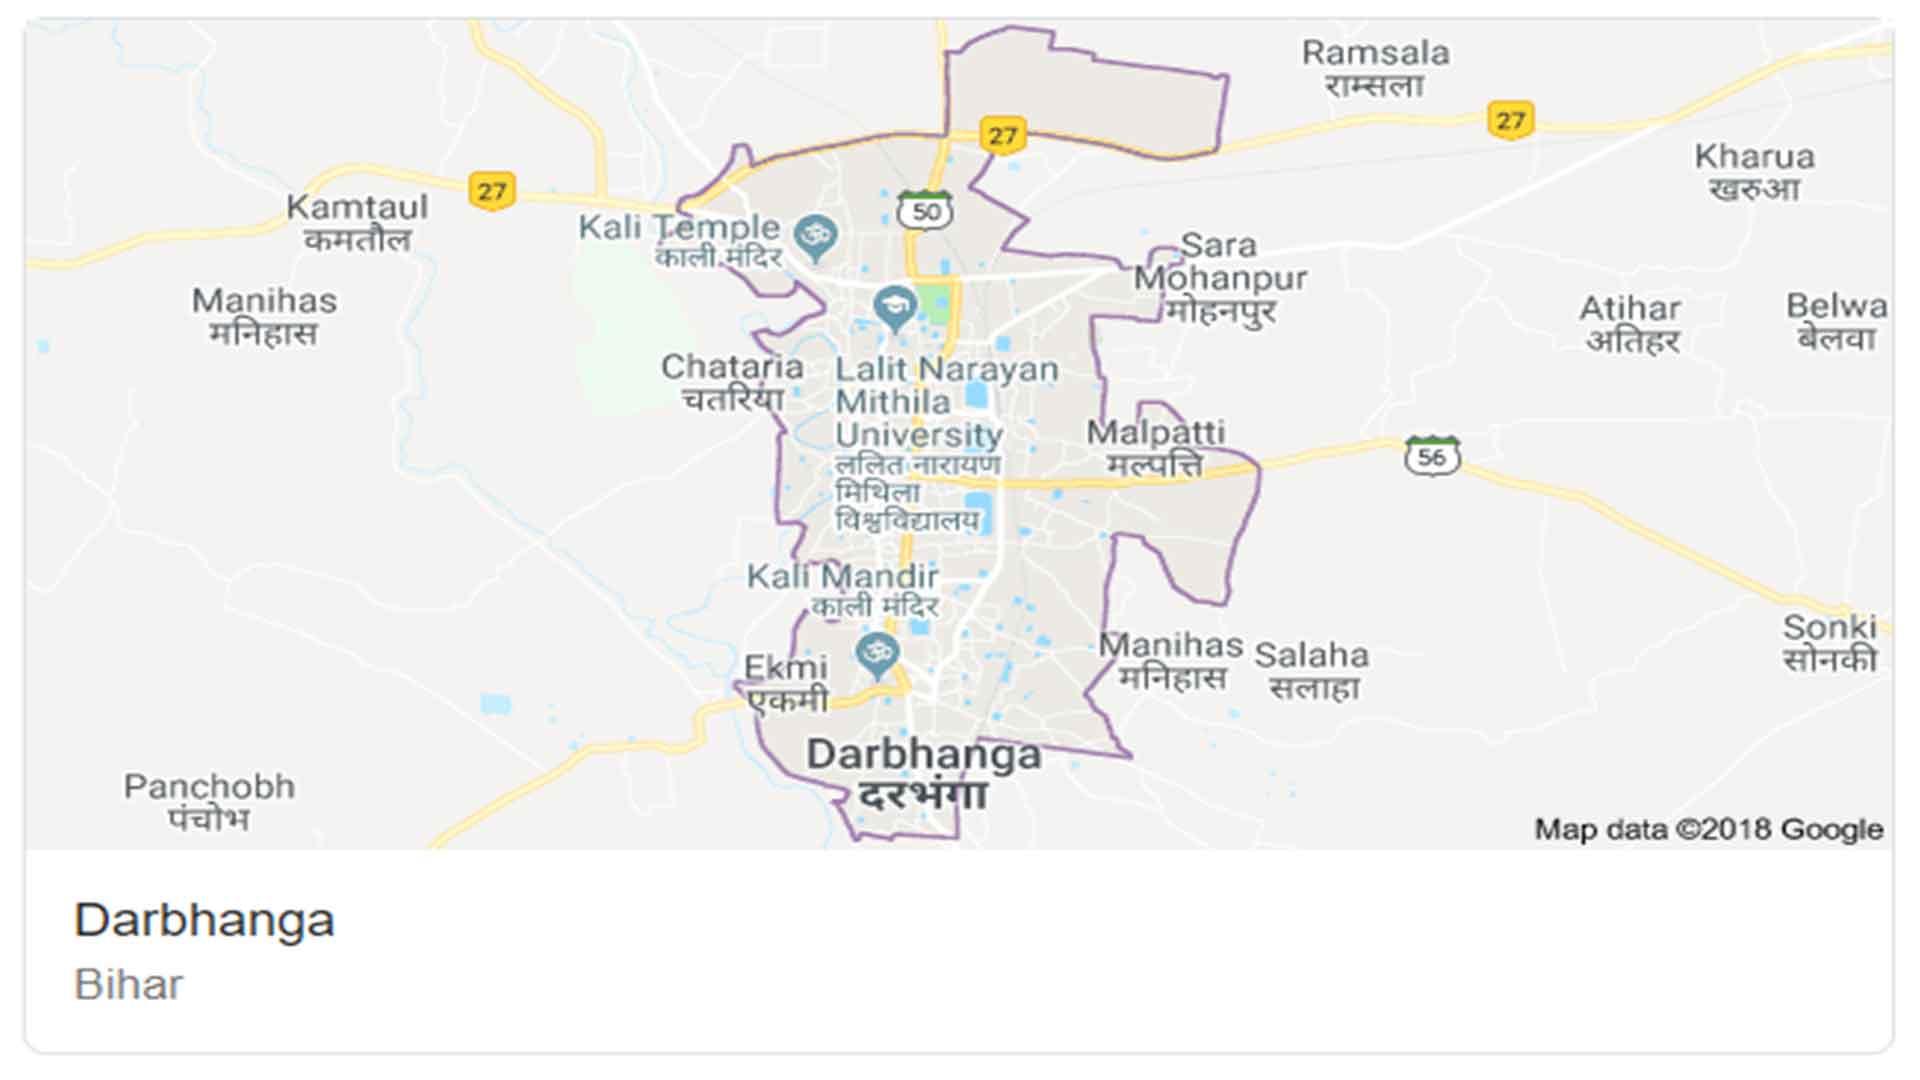 Website Designing Services In Darbhanga, Bihar, India